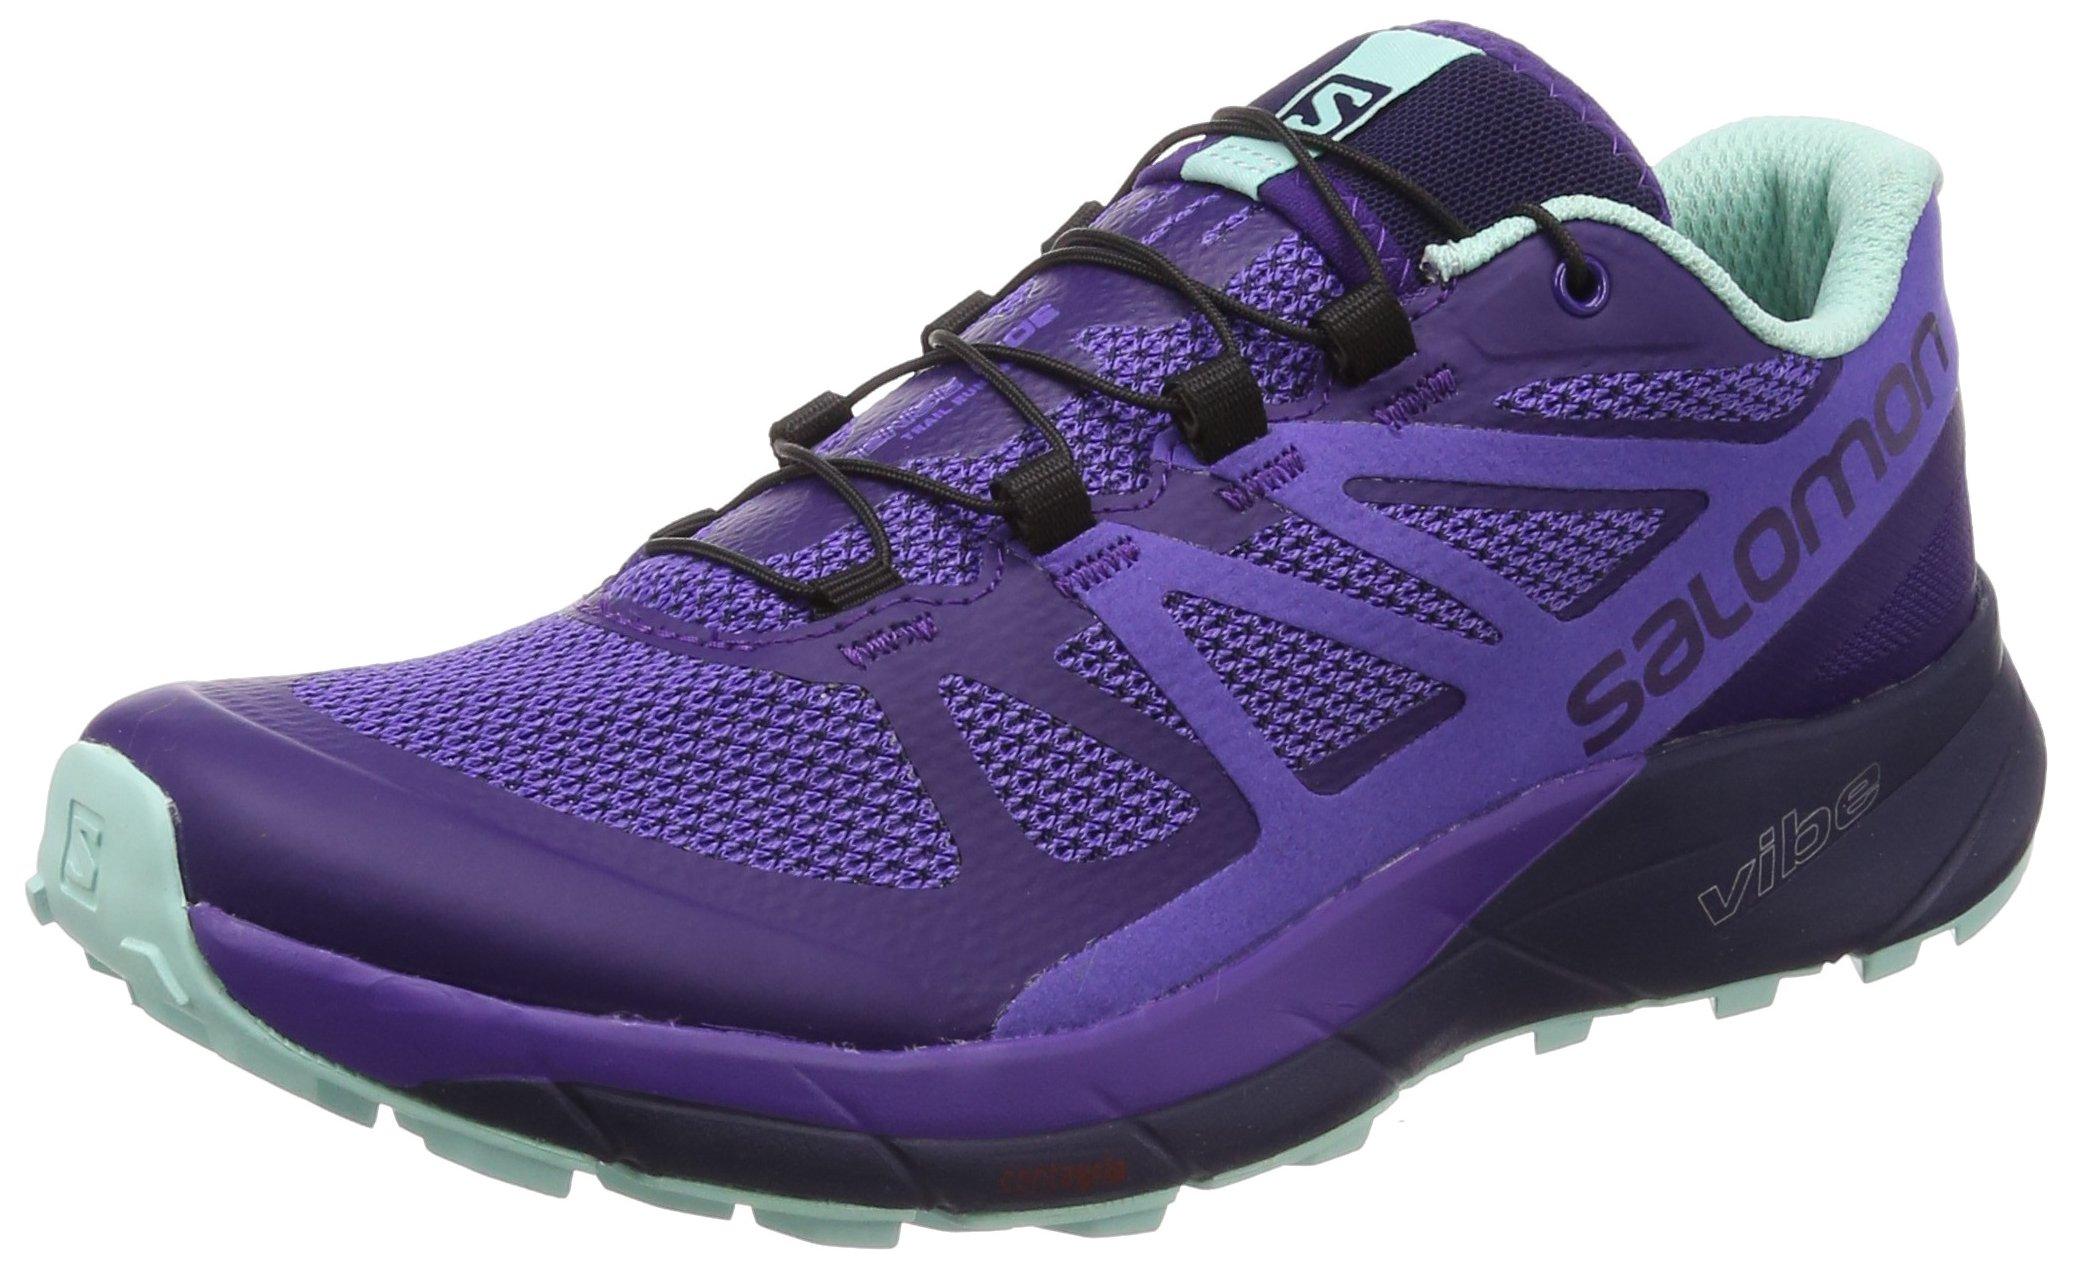 Salomon Women's Sense Ride Running Shoes, Purple, 6.5 M